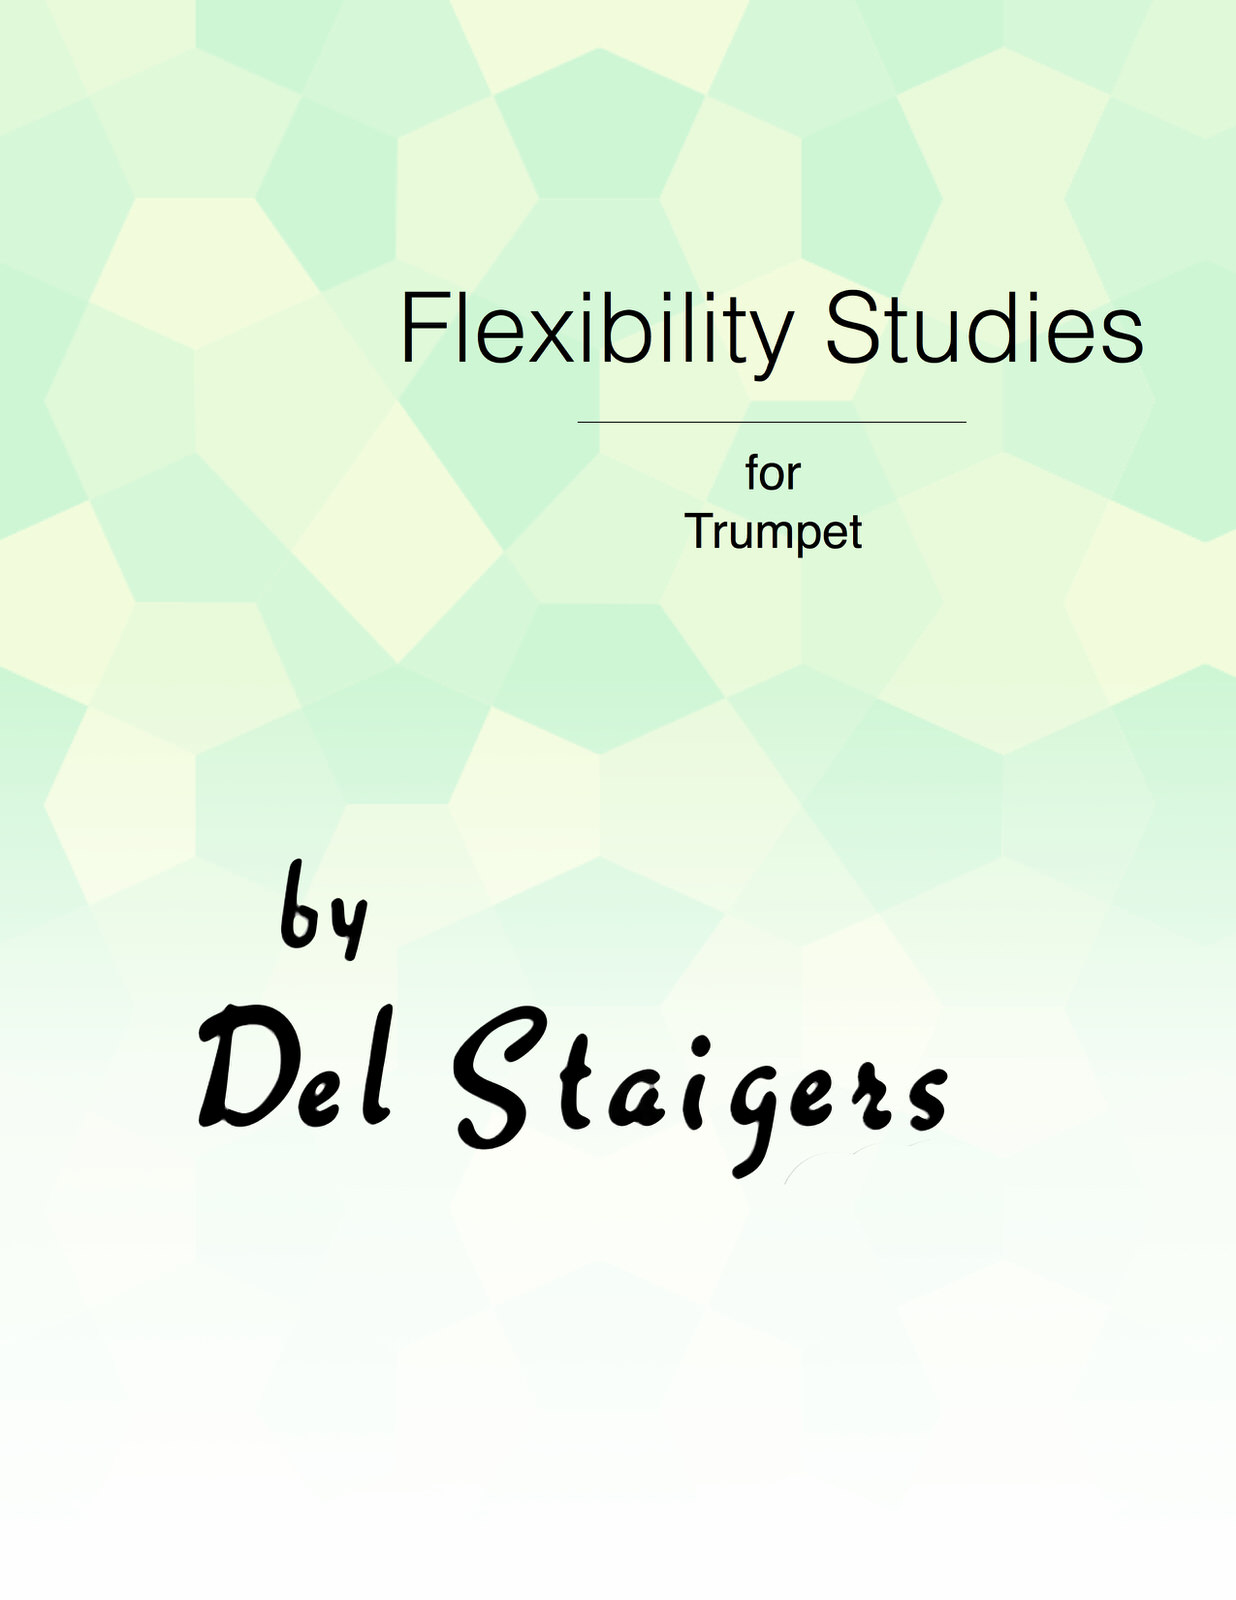 staigers-flexibility-studies-1